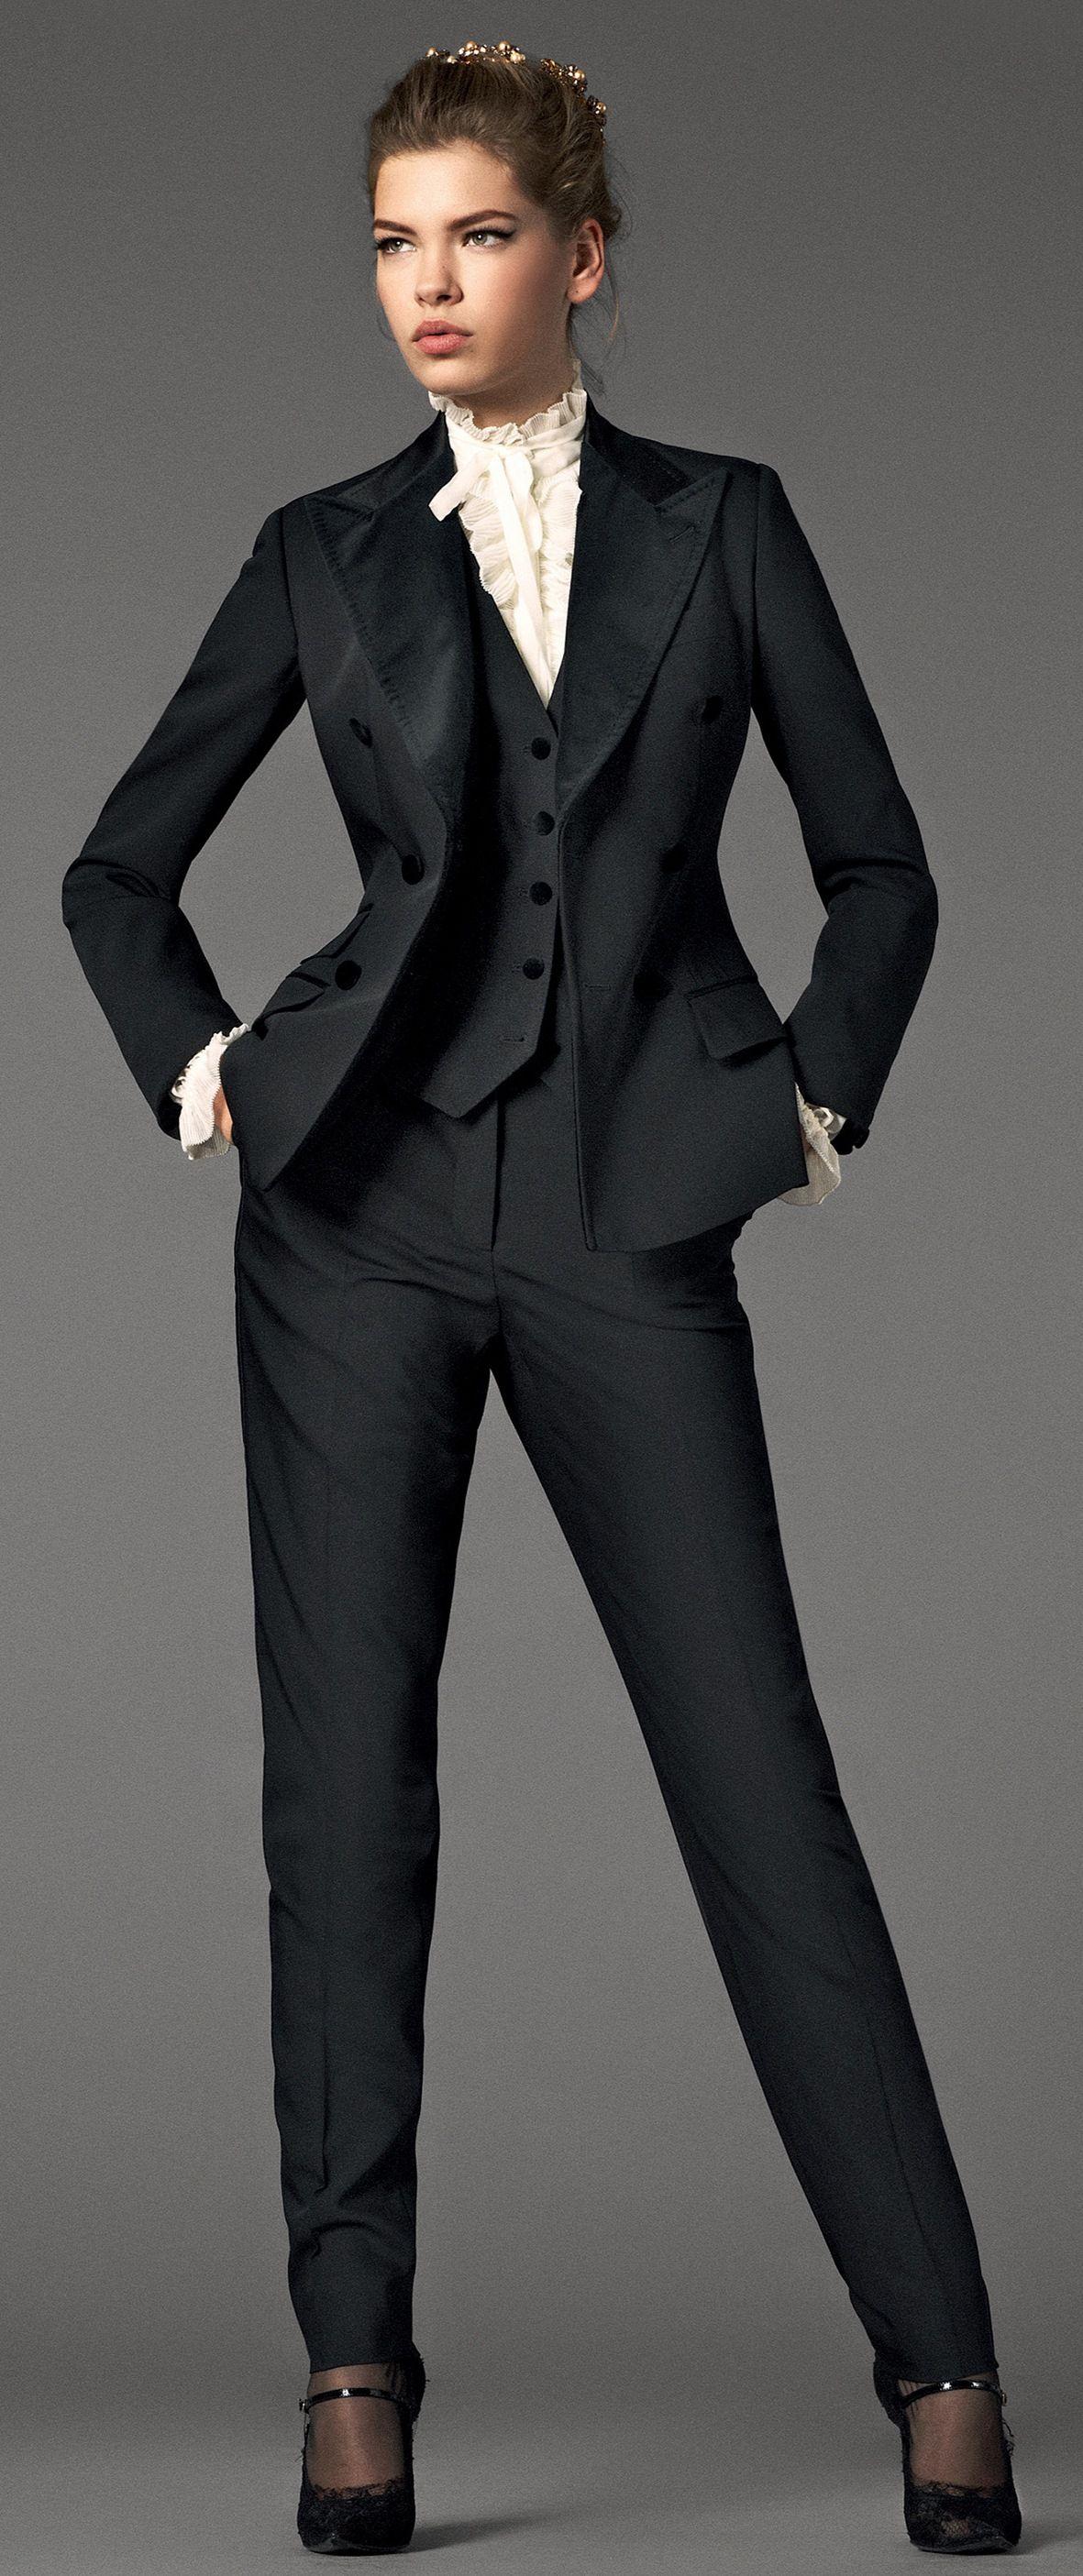 21 elegant trendy classic fashion trouser suits